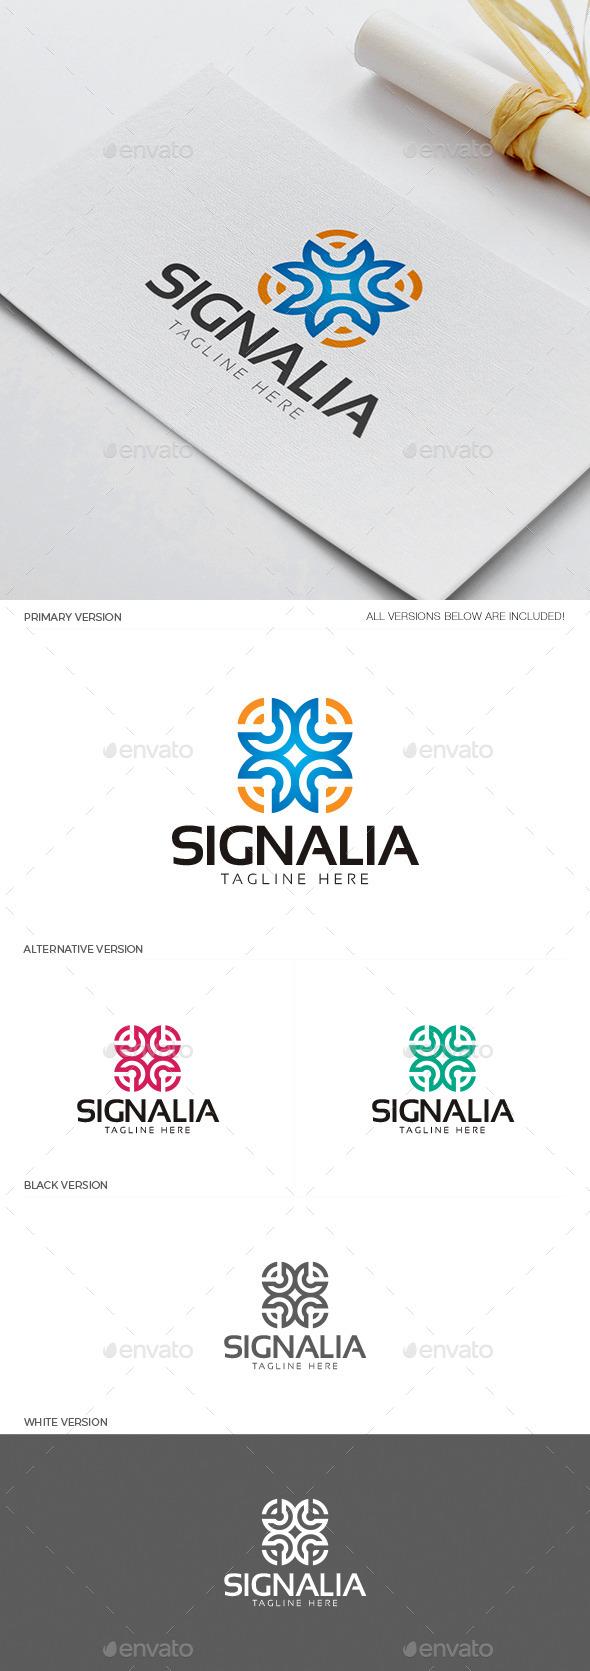 Signalia Logo